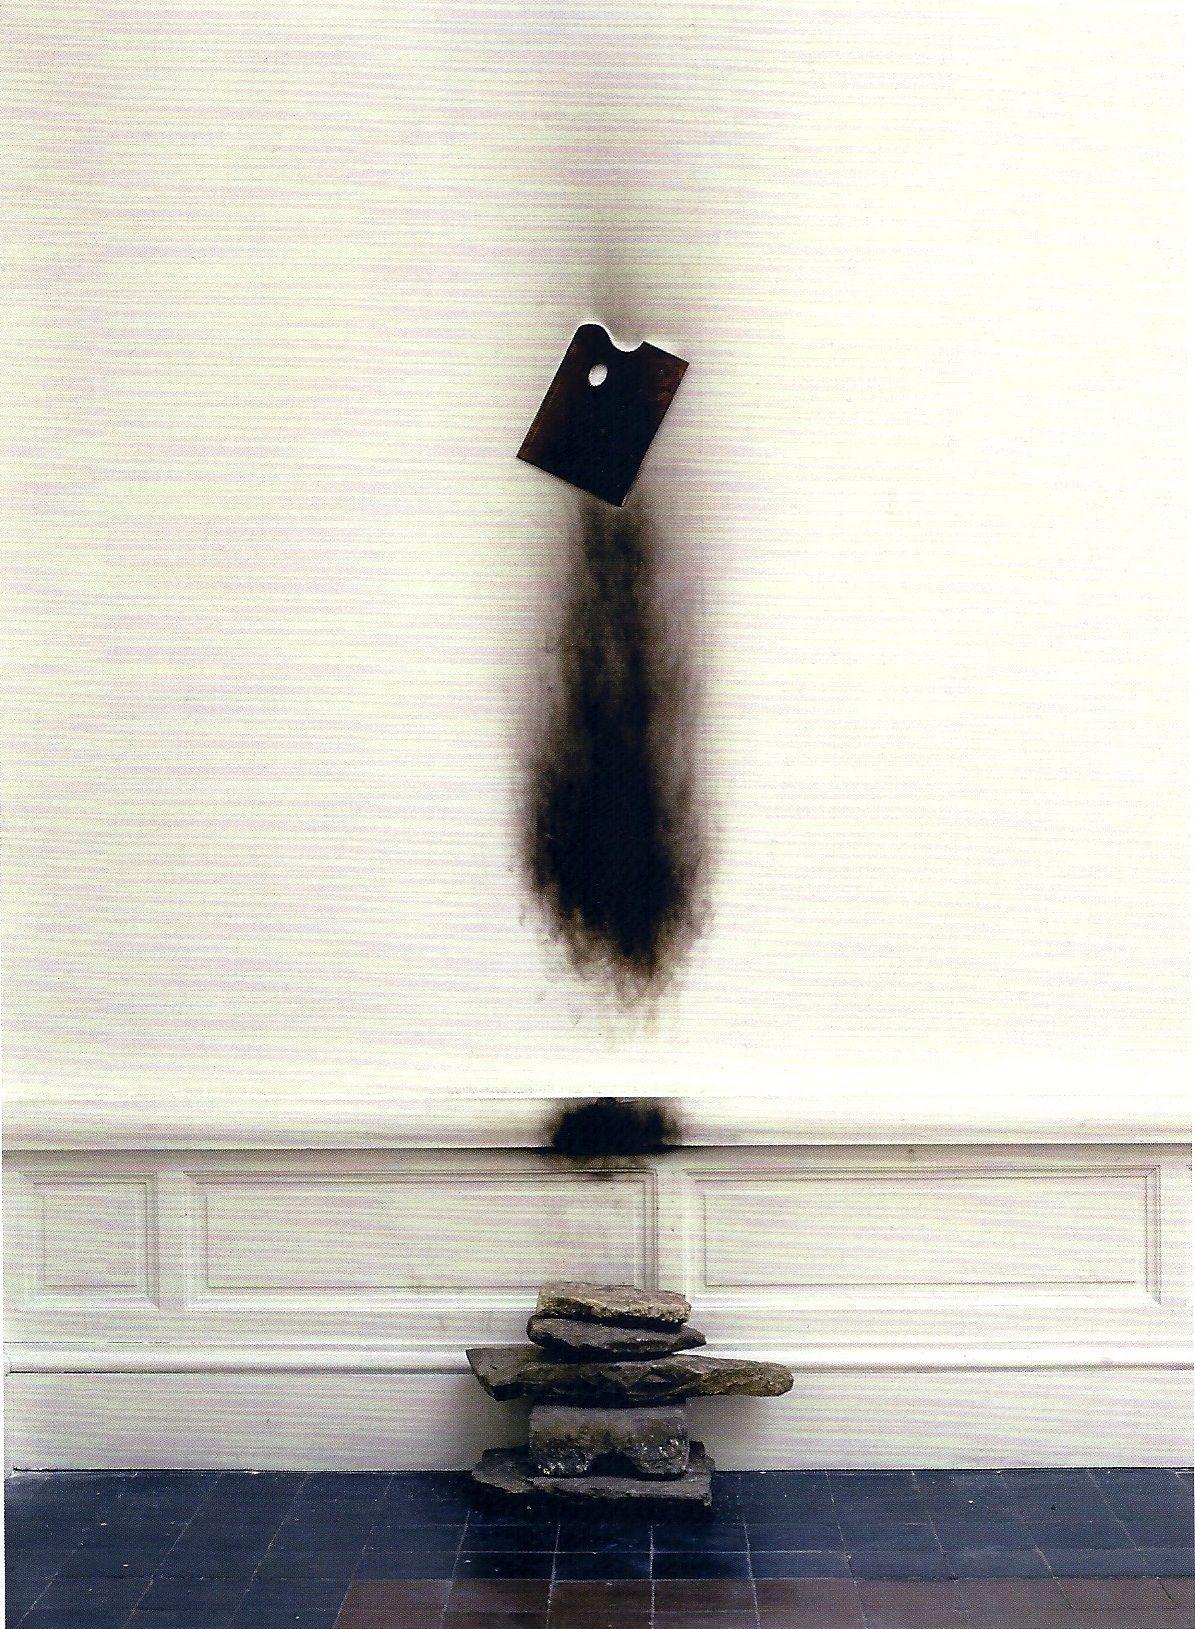 Jannis Kounellis - Directing/What's left behind